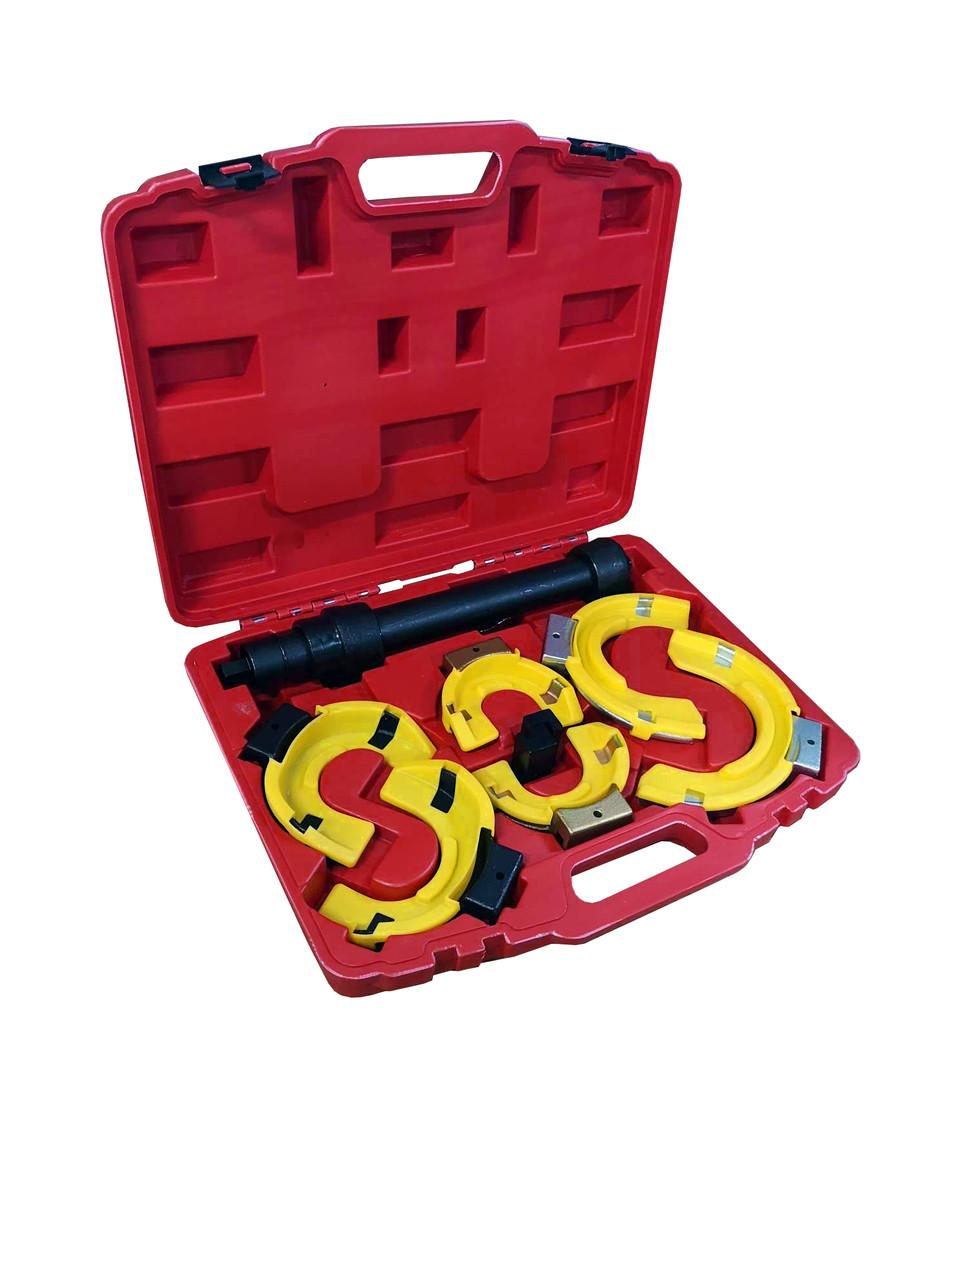 ROCKFORCE Стяжка пружин с 3-мя парами захватов и пластиковыми накладками, 7 предметов(раб.